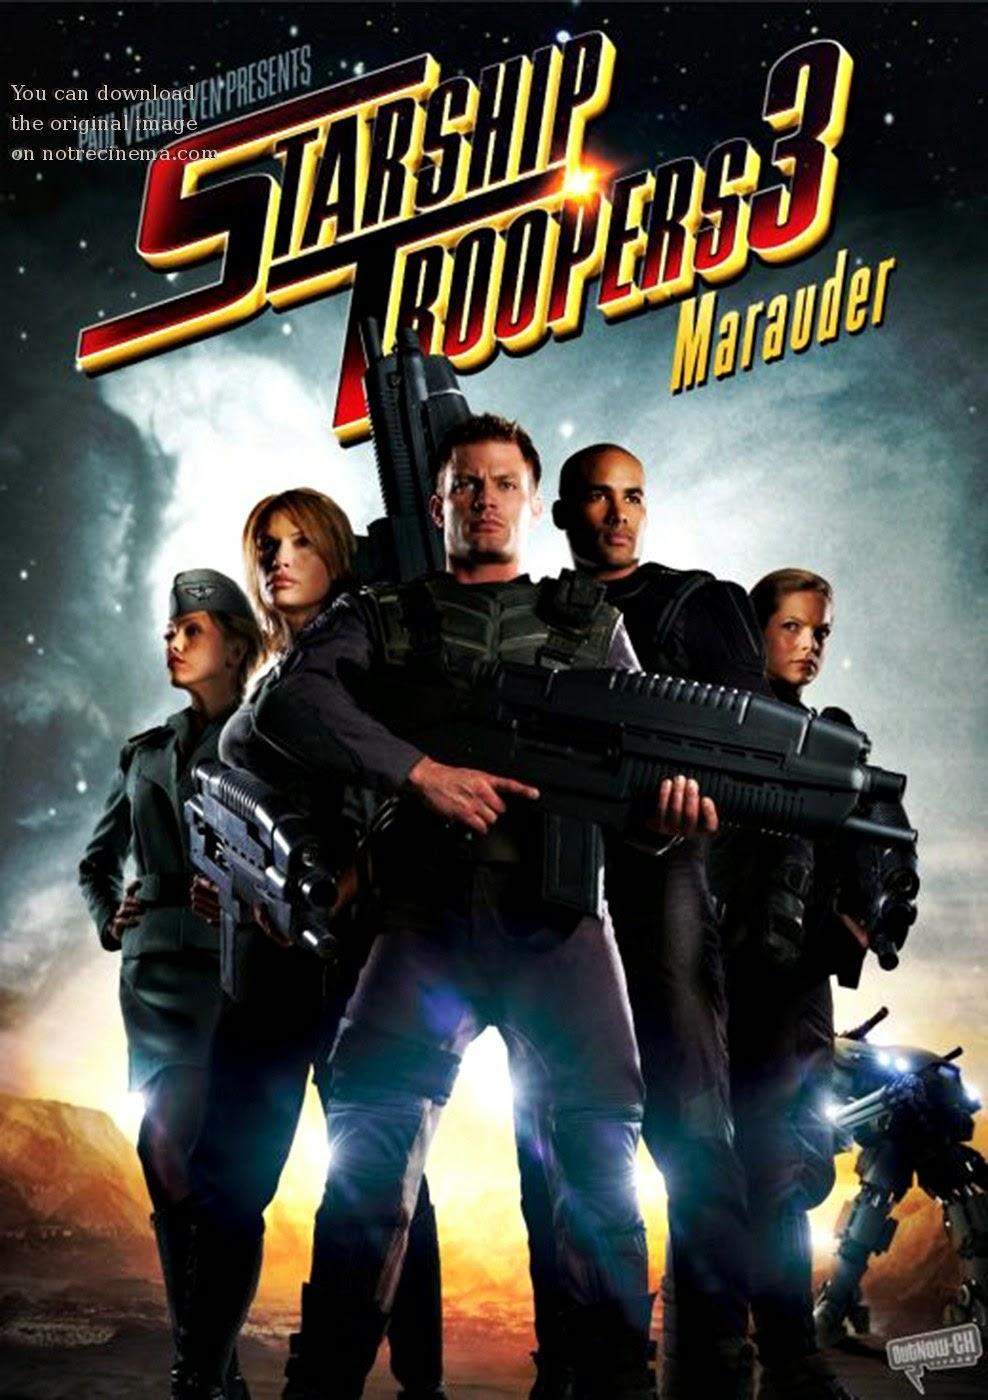 Starship Troopers 3: Marauder สงครามหมื่นขา ล่าล้างจักรวาล 3 [HD][พากย์ไทย]